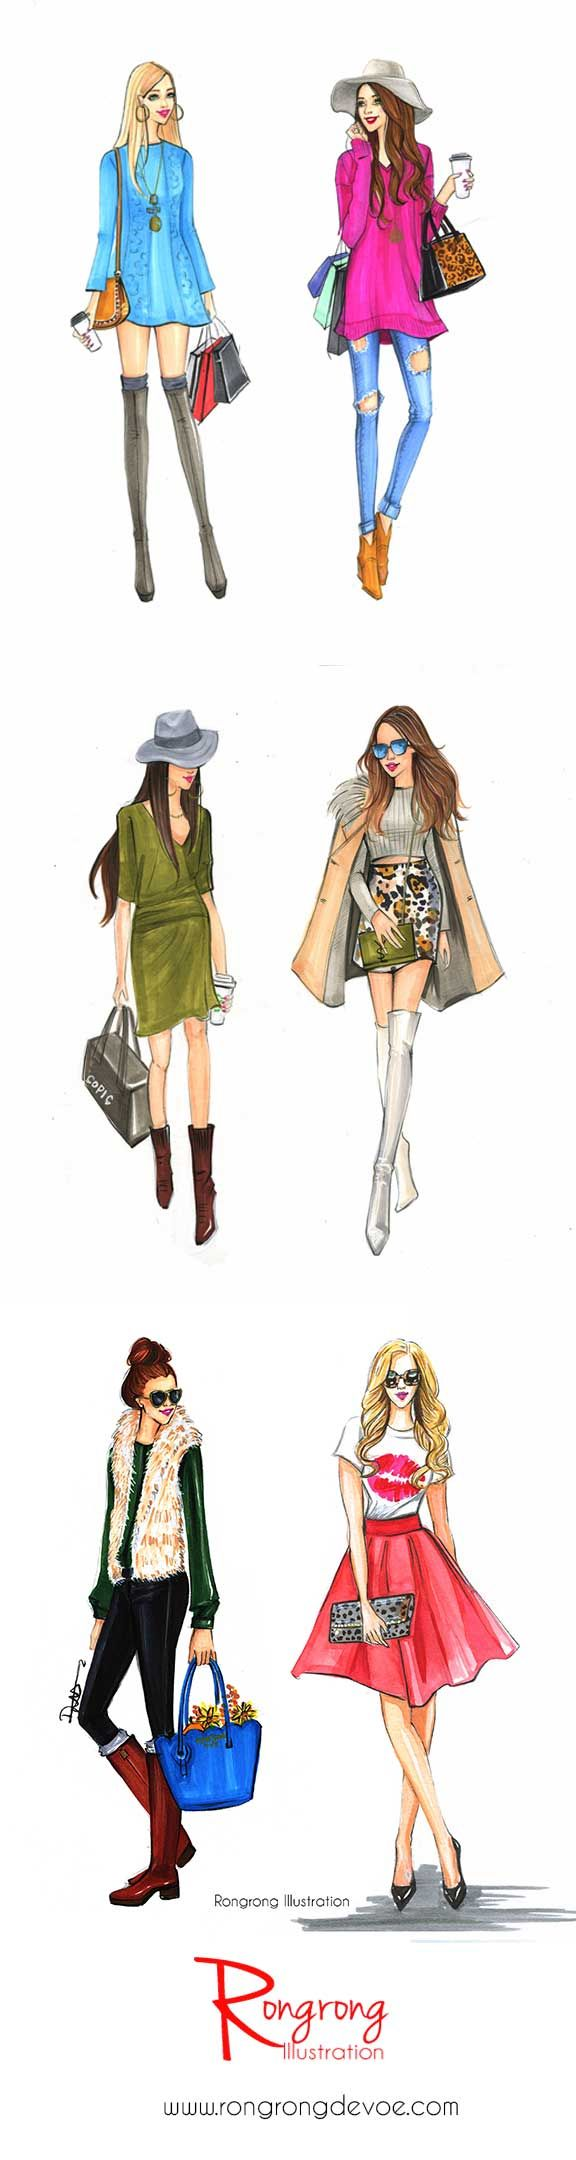 Street fashion styles illustrations by Houston fashion illustrator Rongrogn DeVoe. more at www.rongrongillustration.etsy.com